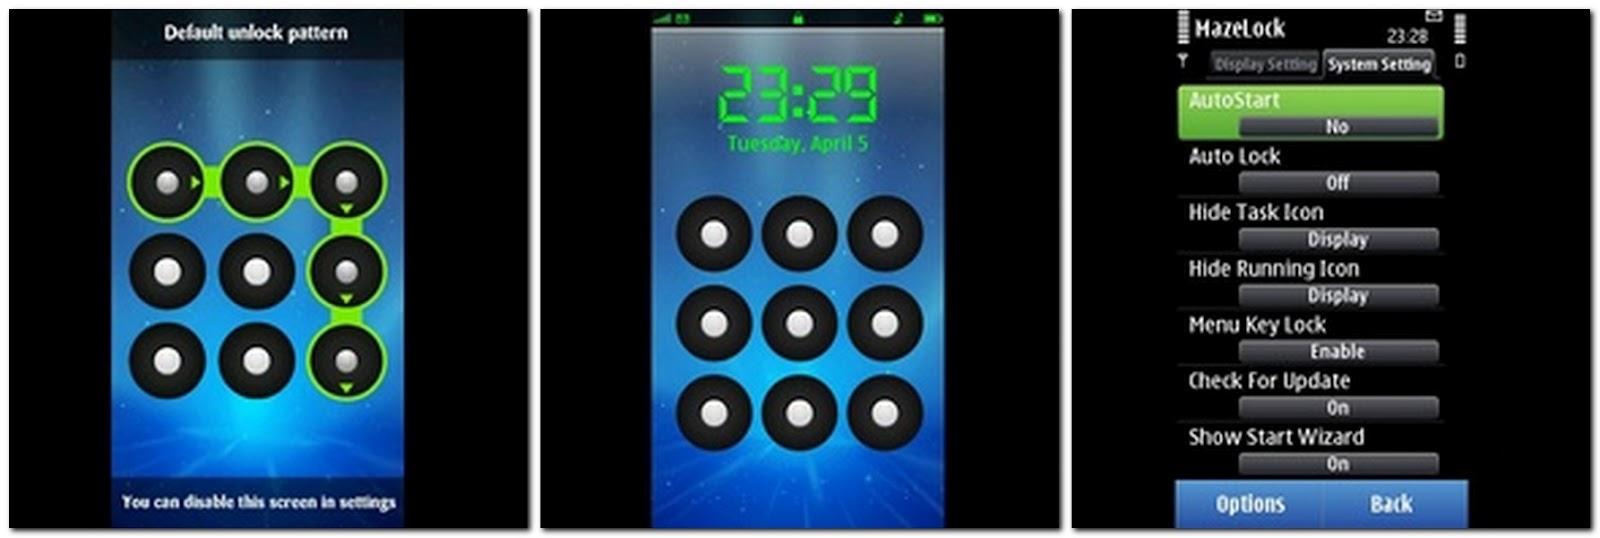 MazeLock V2.2 Free Download for Nokia N8